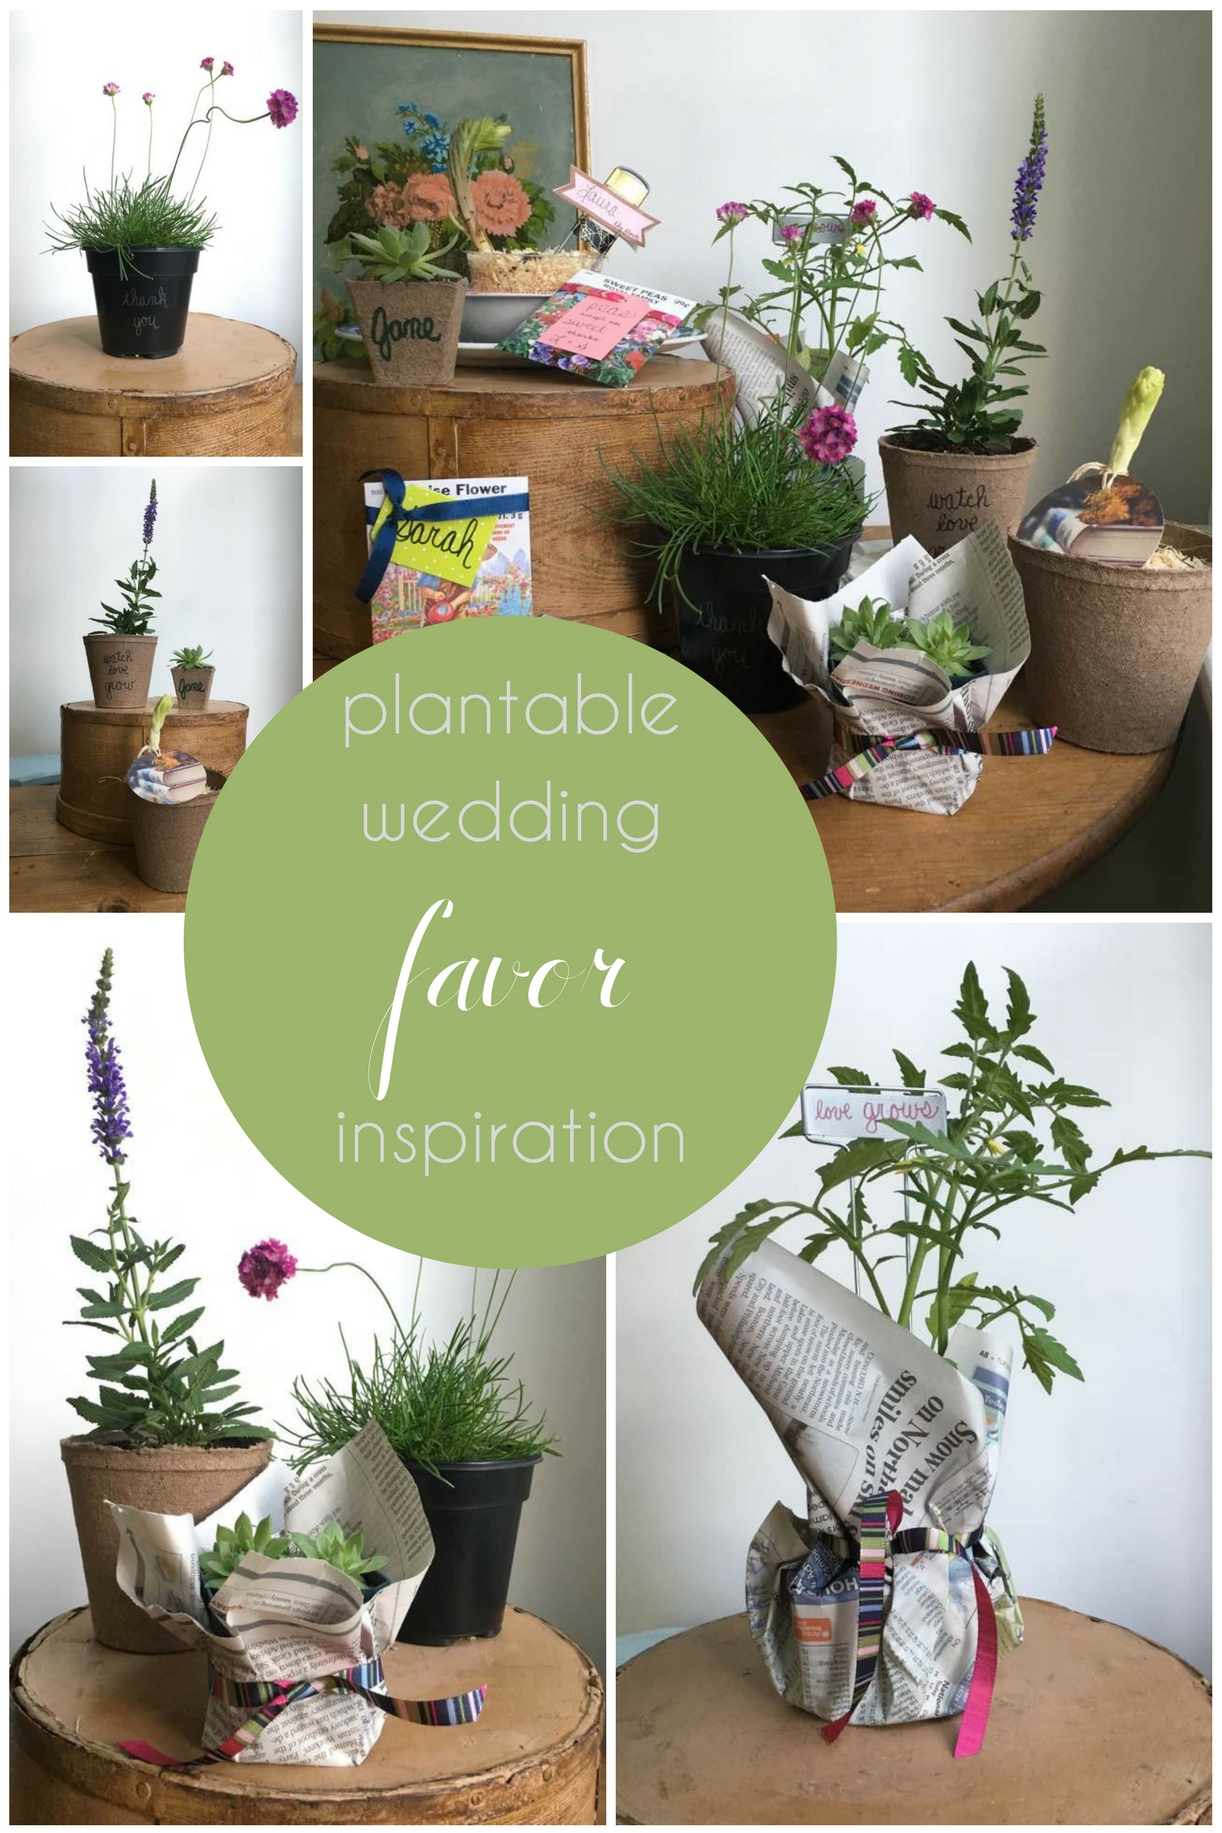 Plantable wedding favors - Plantable Wedding Favors Inspiration Hill City Bride Virginia Wedding Blog